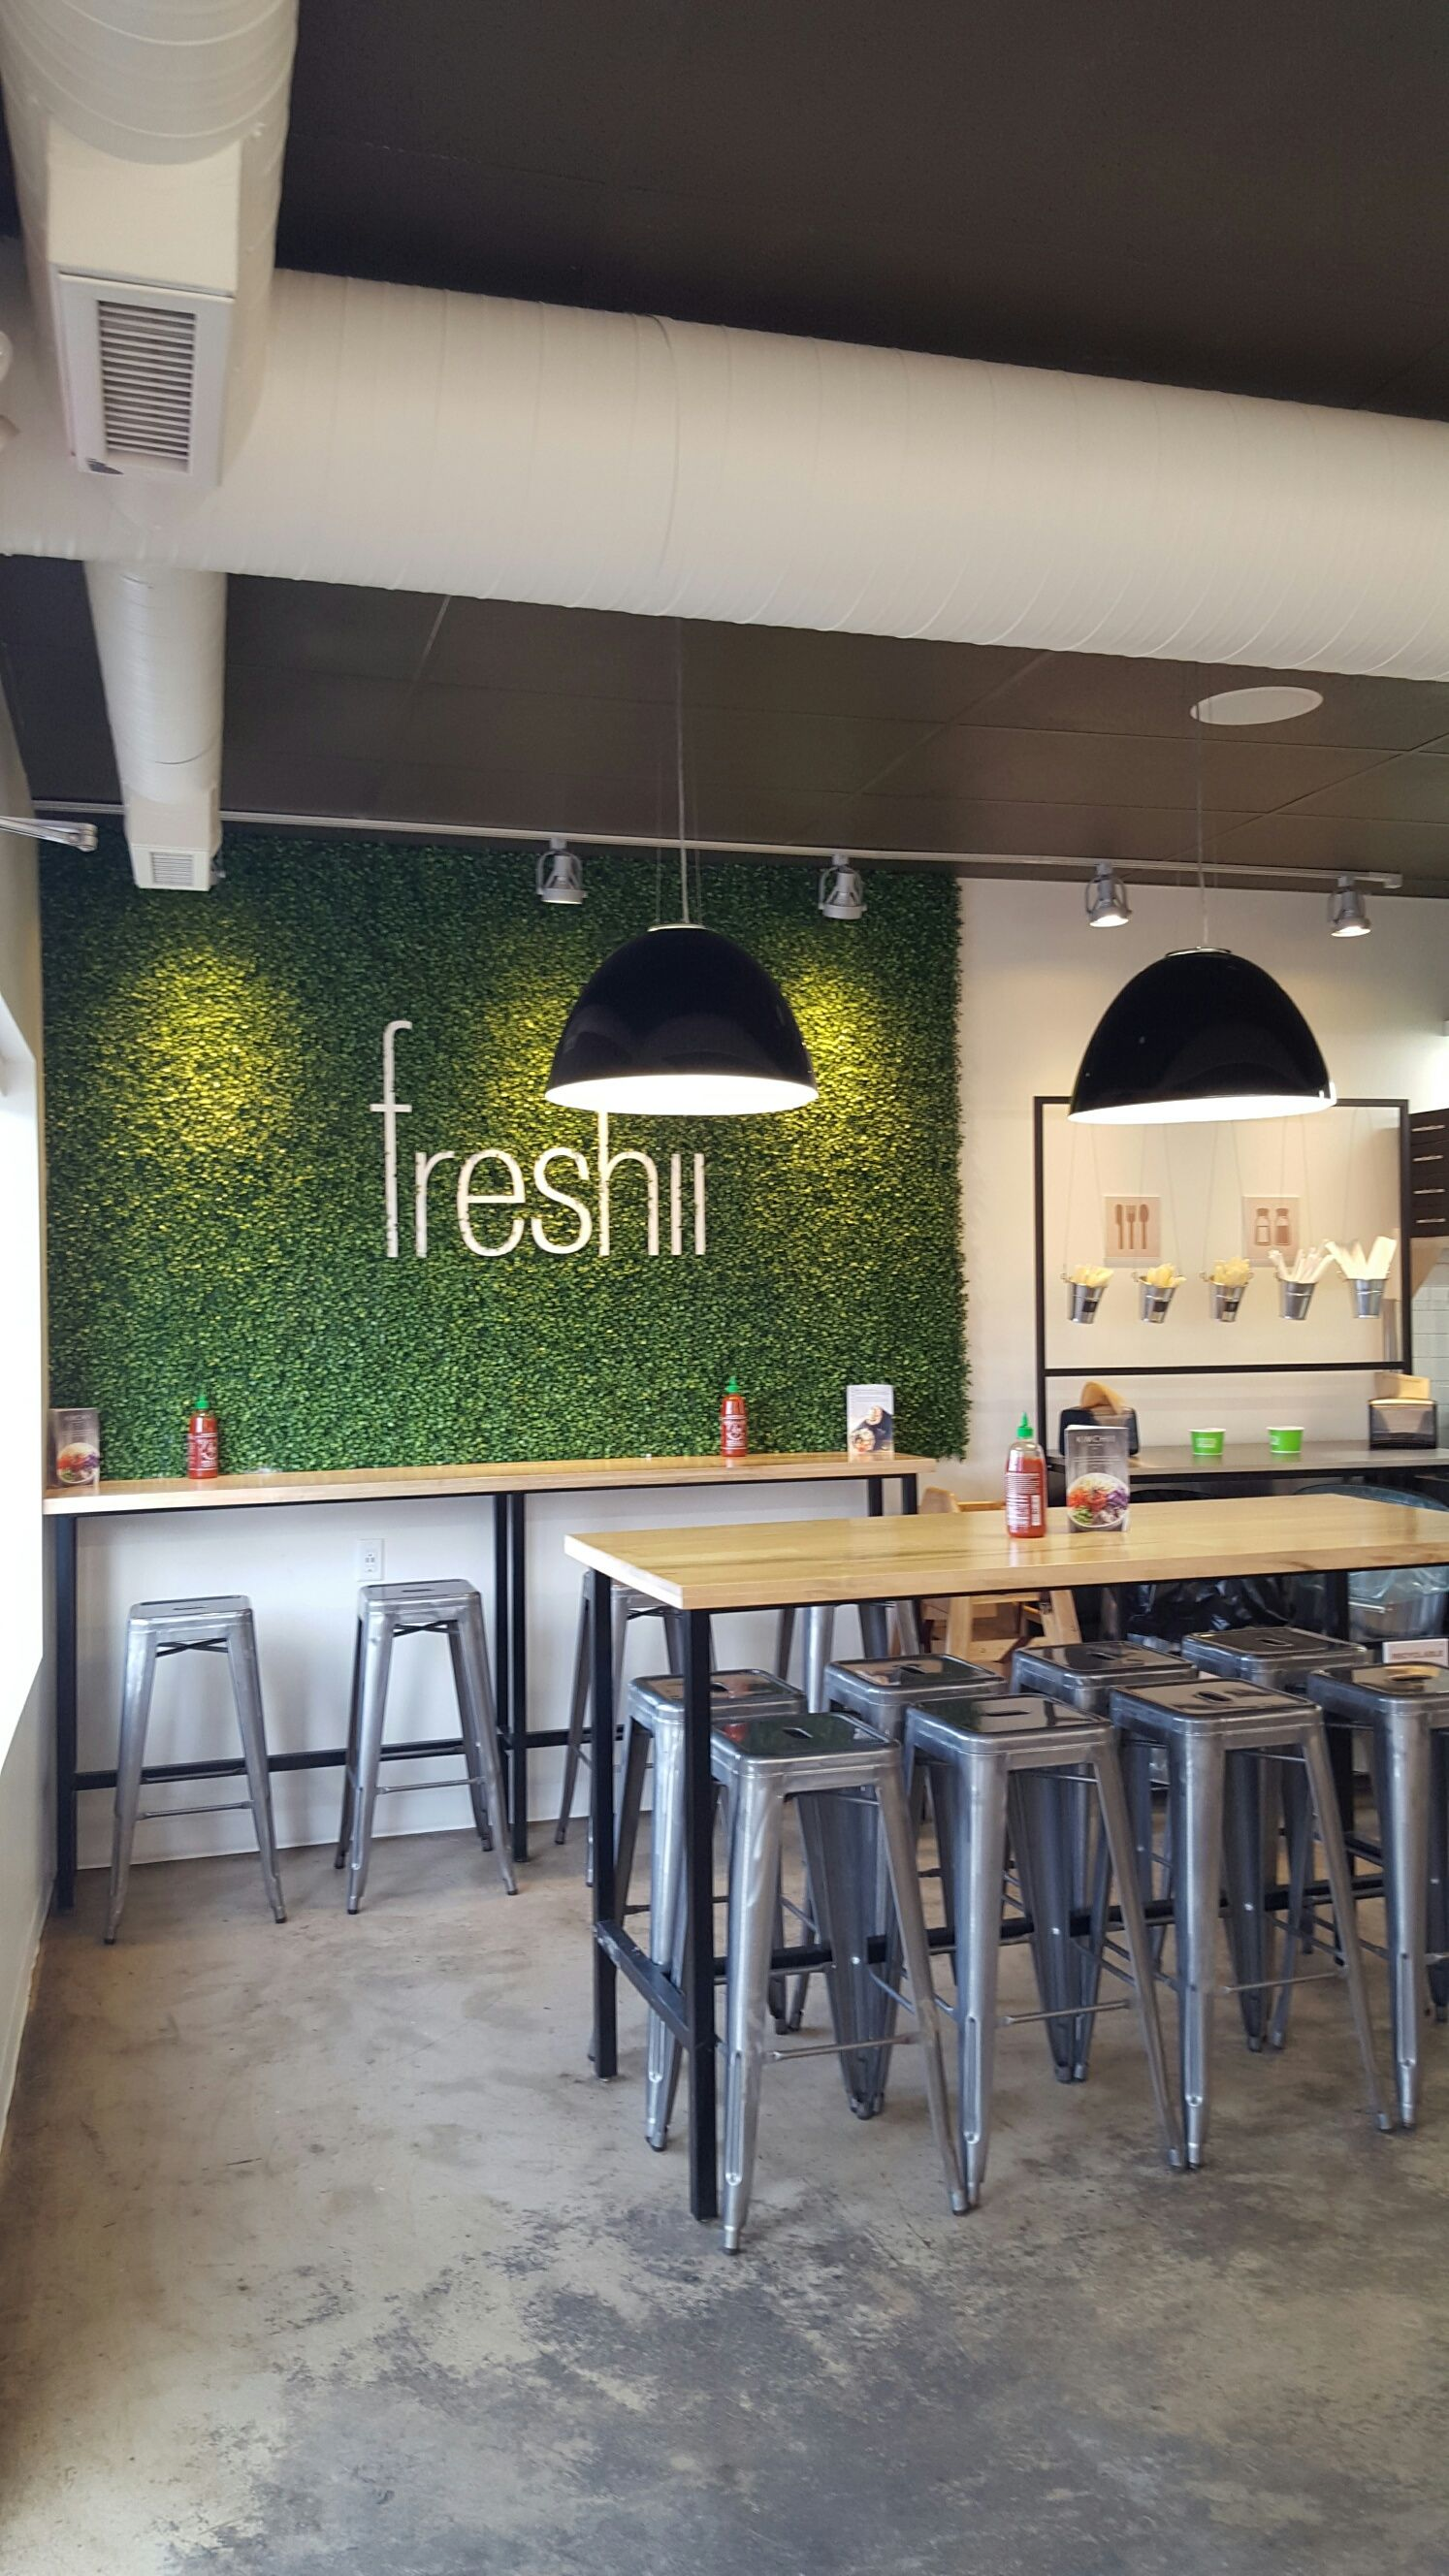 Freshii High Top Communal Table Restaurant Design Pinte - High top communal table